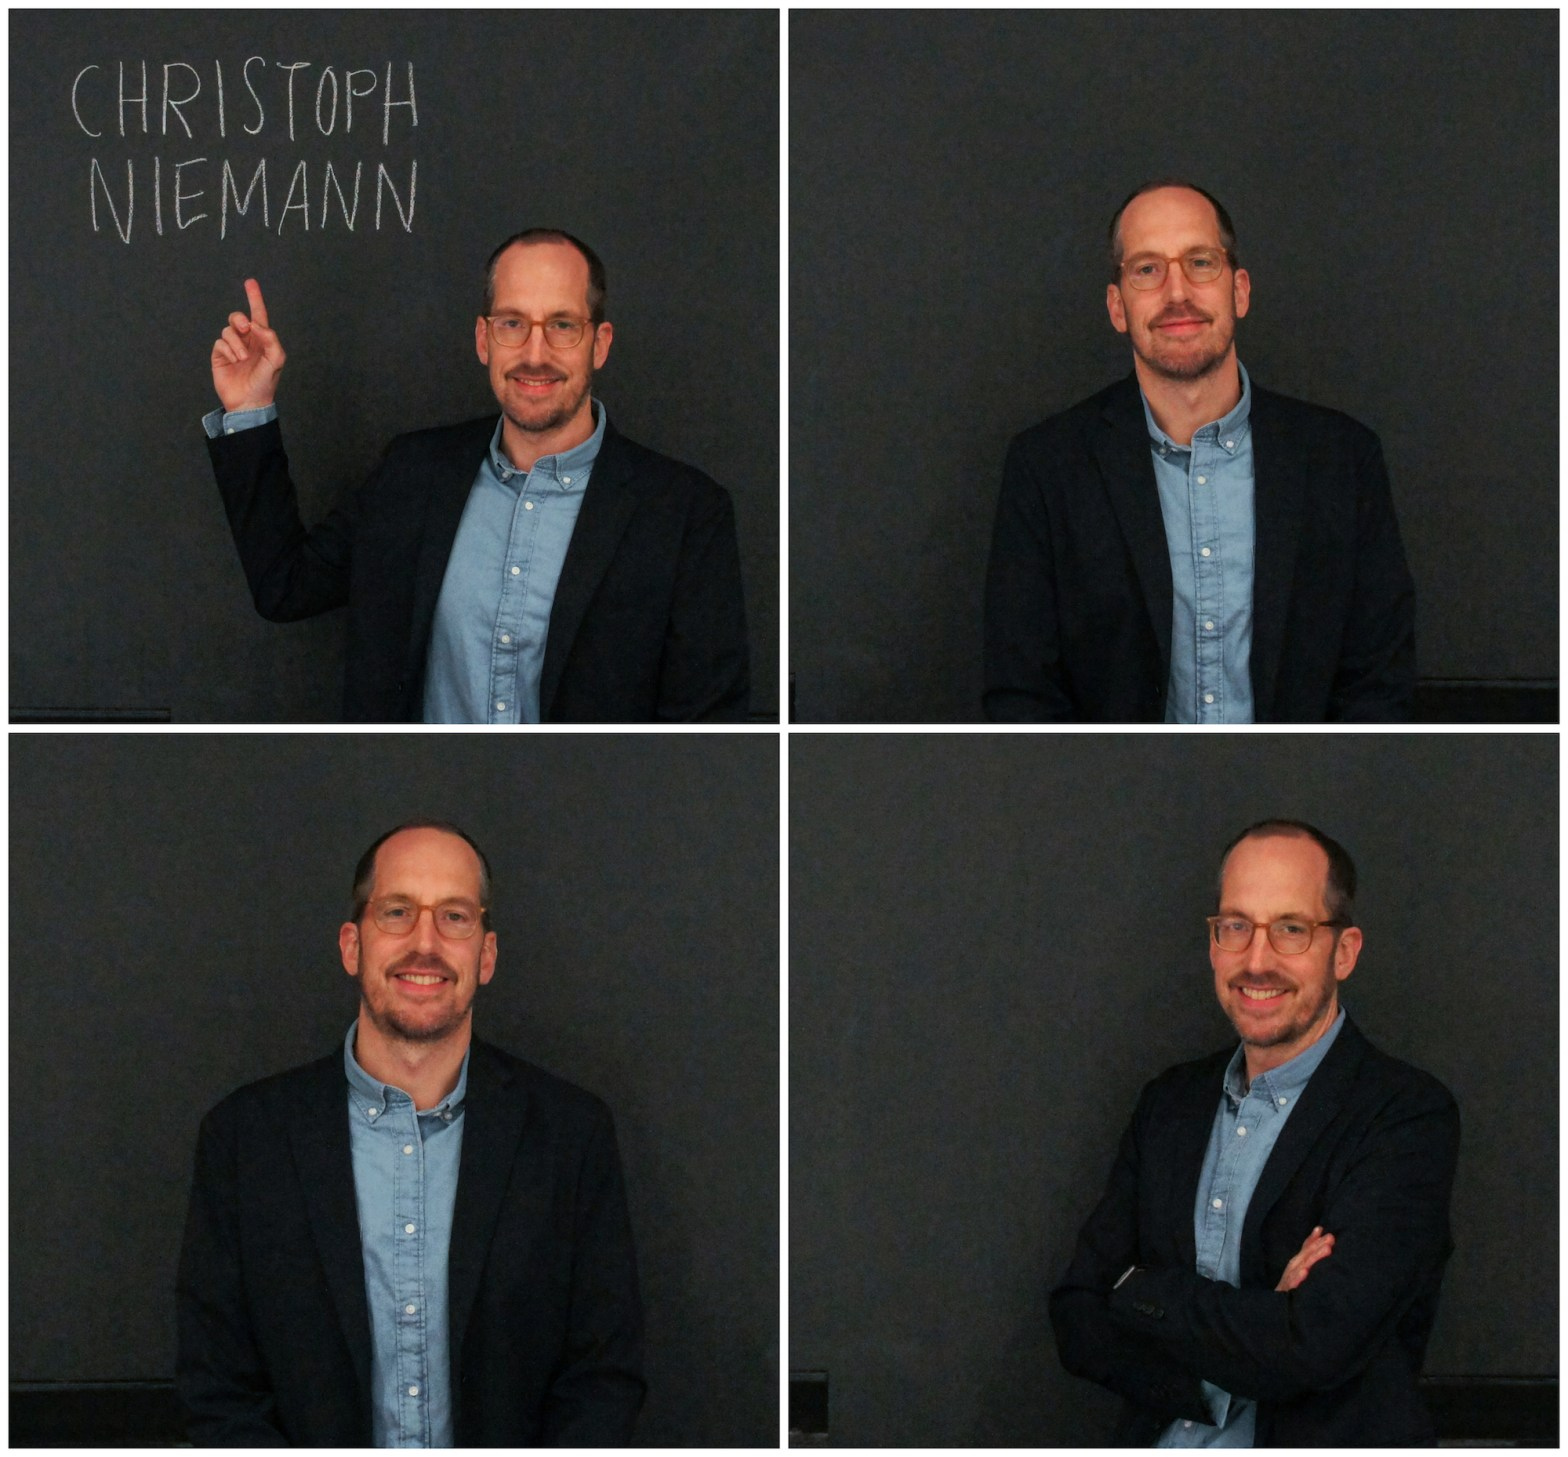 Thumbnail for Christoph Niemann